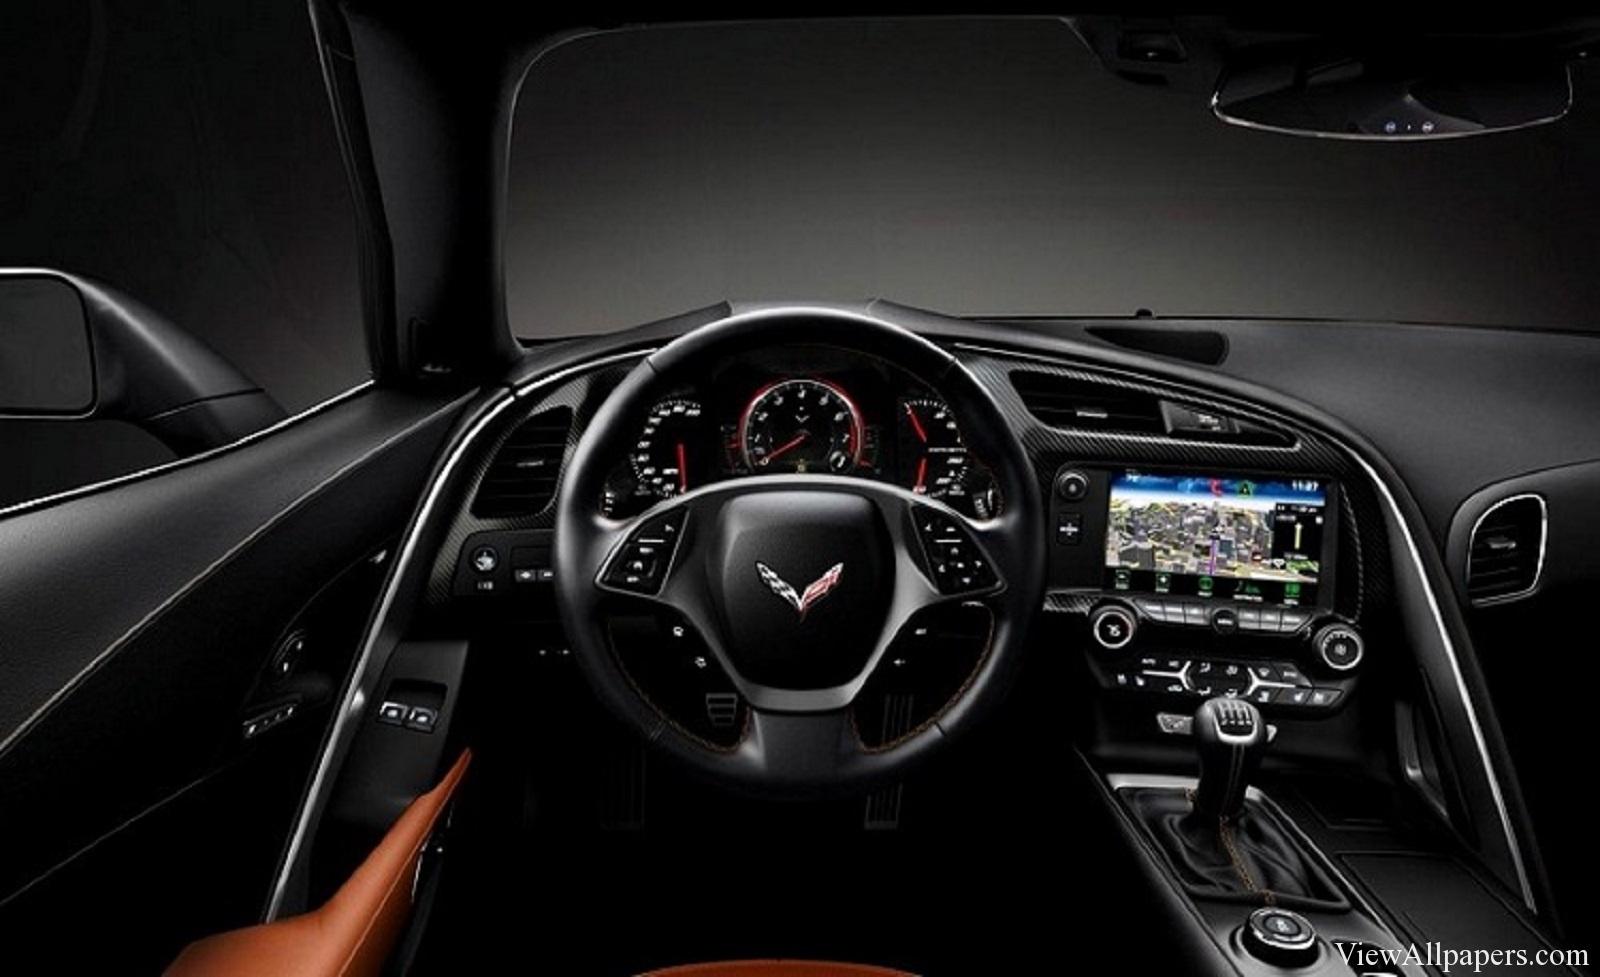 2016 Corvette Z07 Interior High Resolution Wallpaper download 1600x977